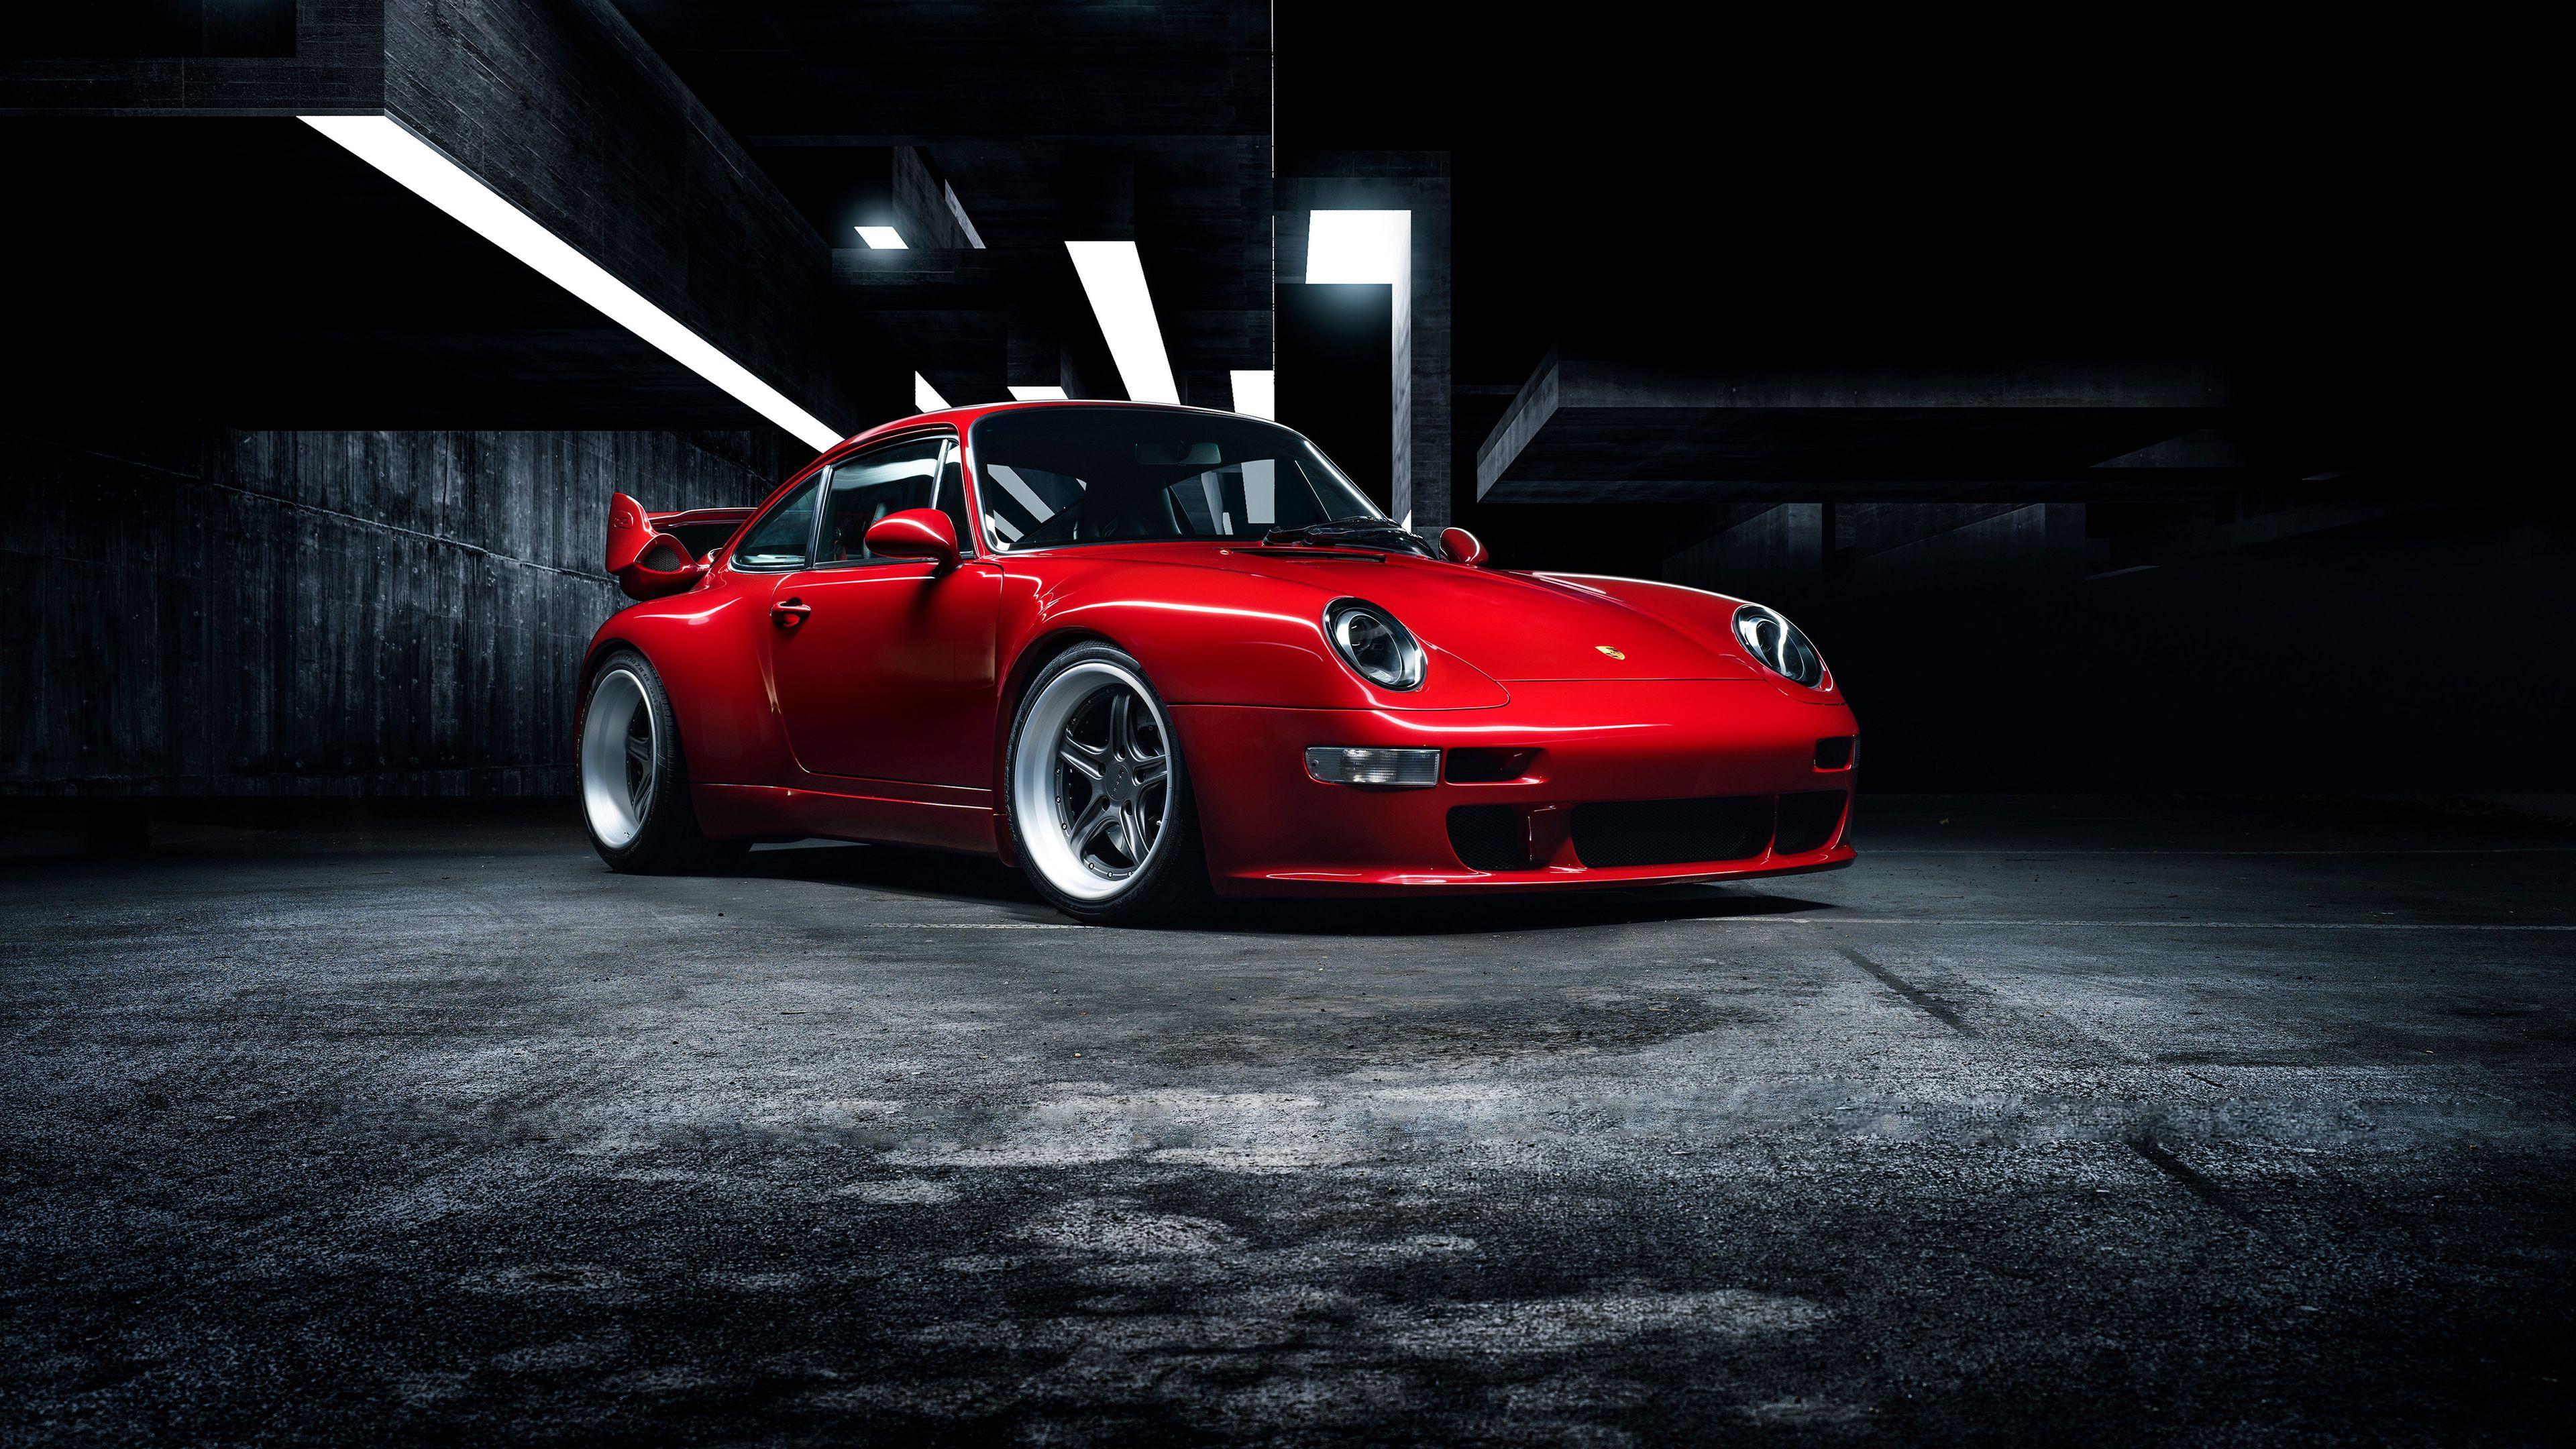 Rwb Porsche Iphone Wallpaper